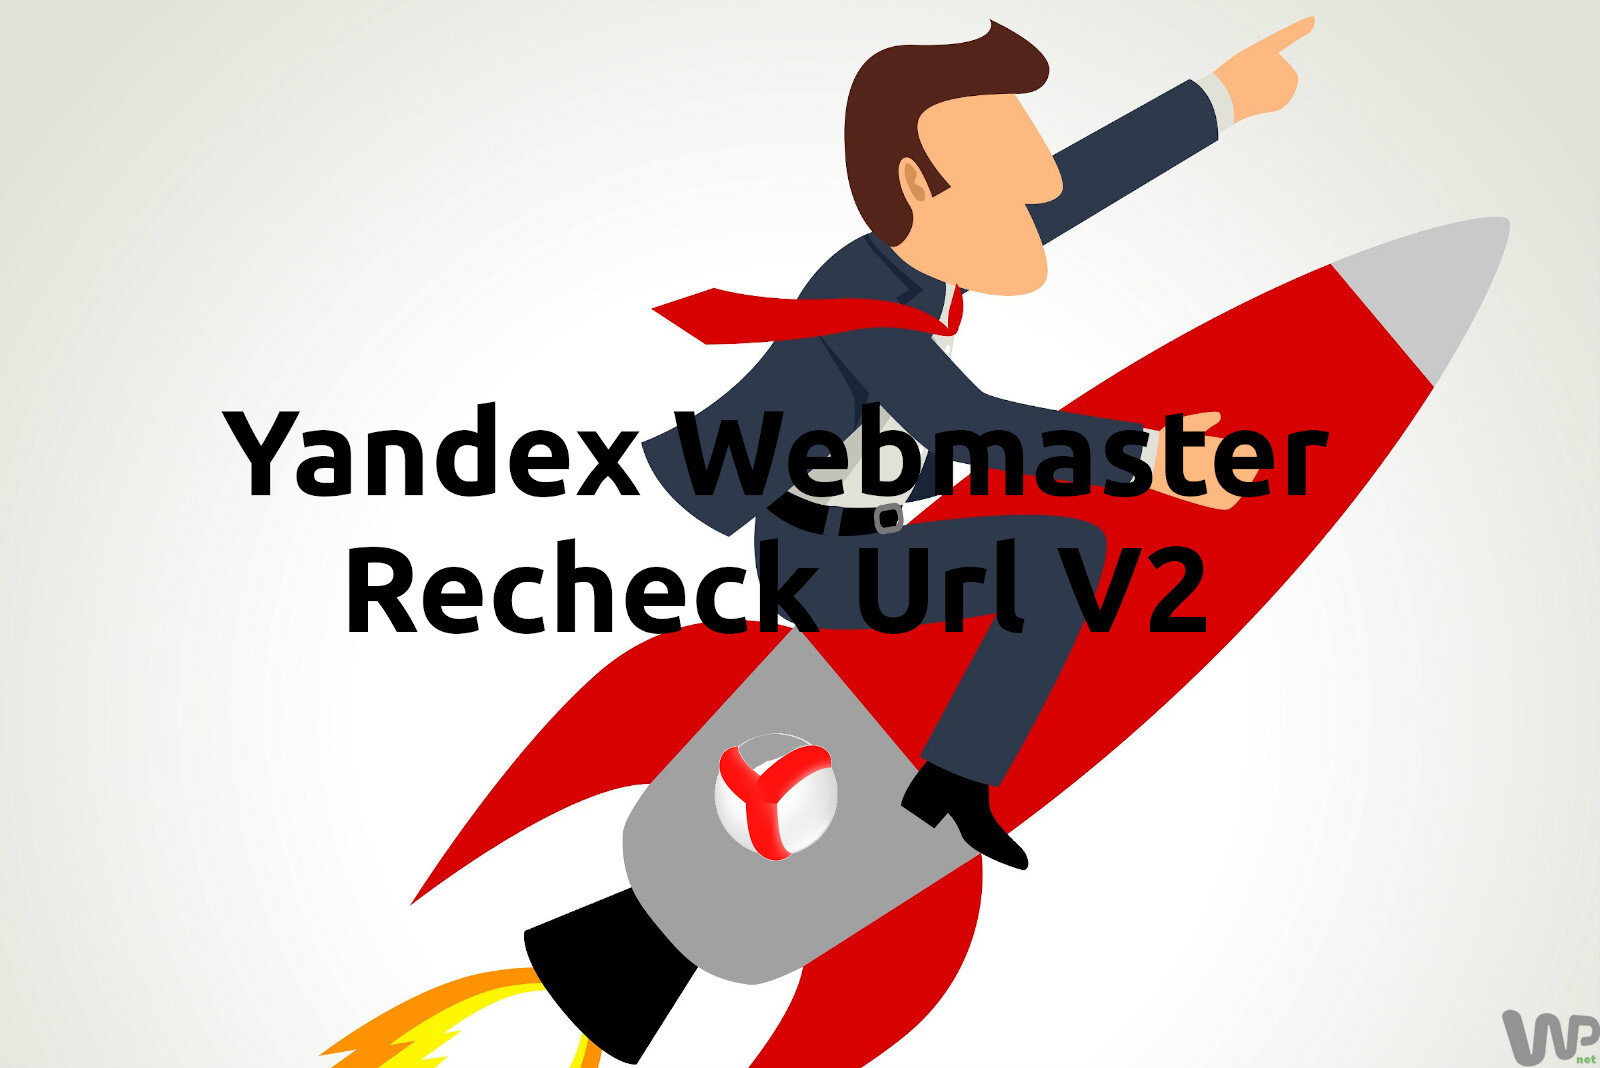 Yandex Webmaster Recheck Url